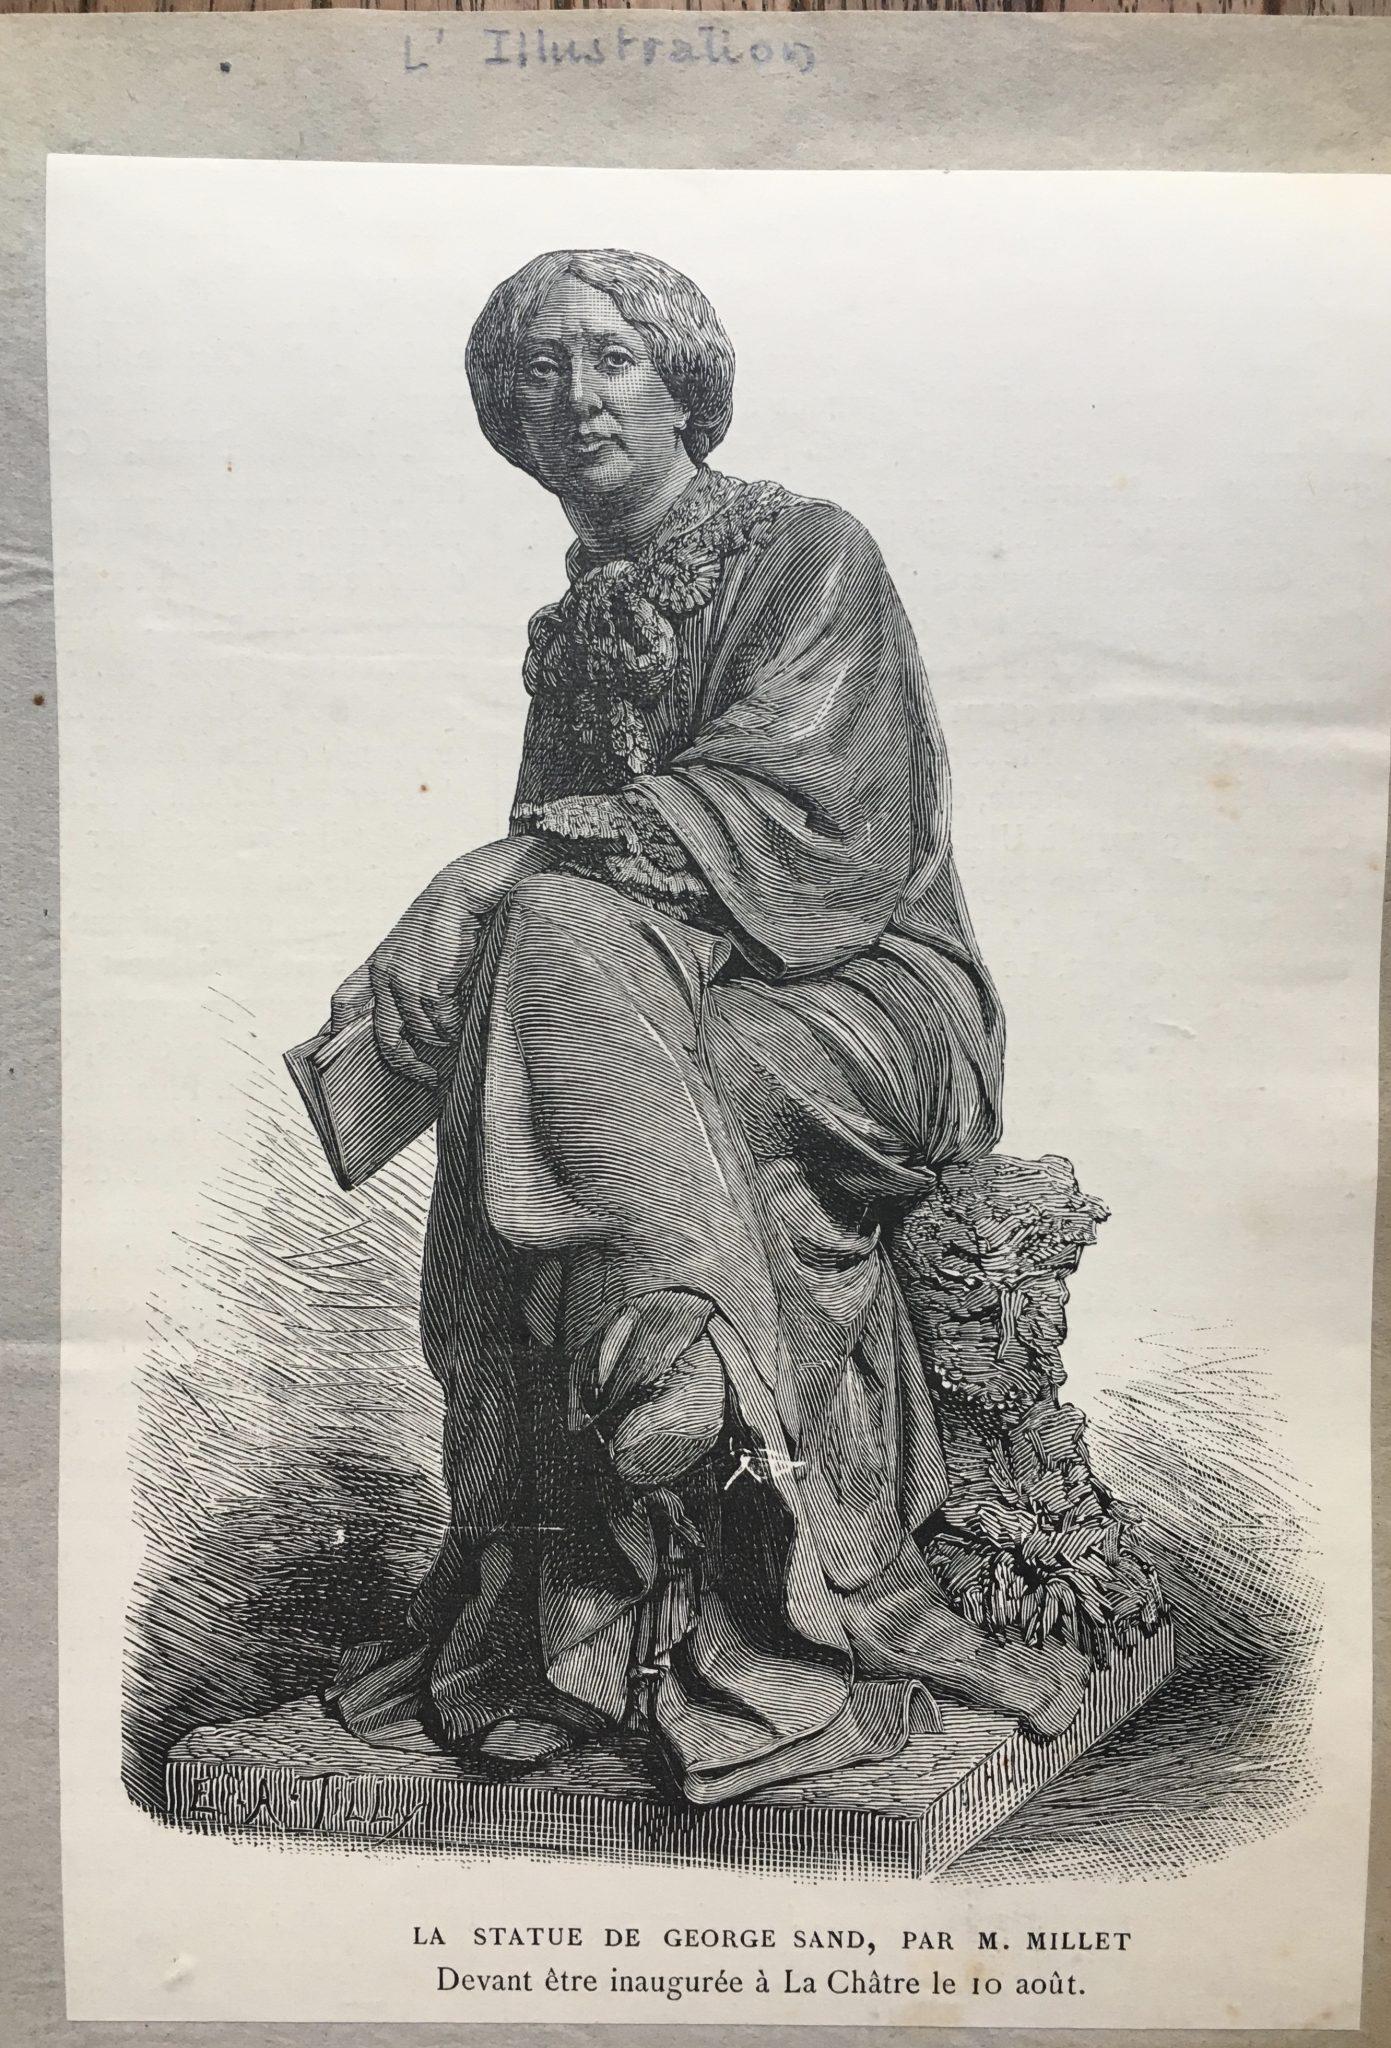 L'Illustration, La Statue